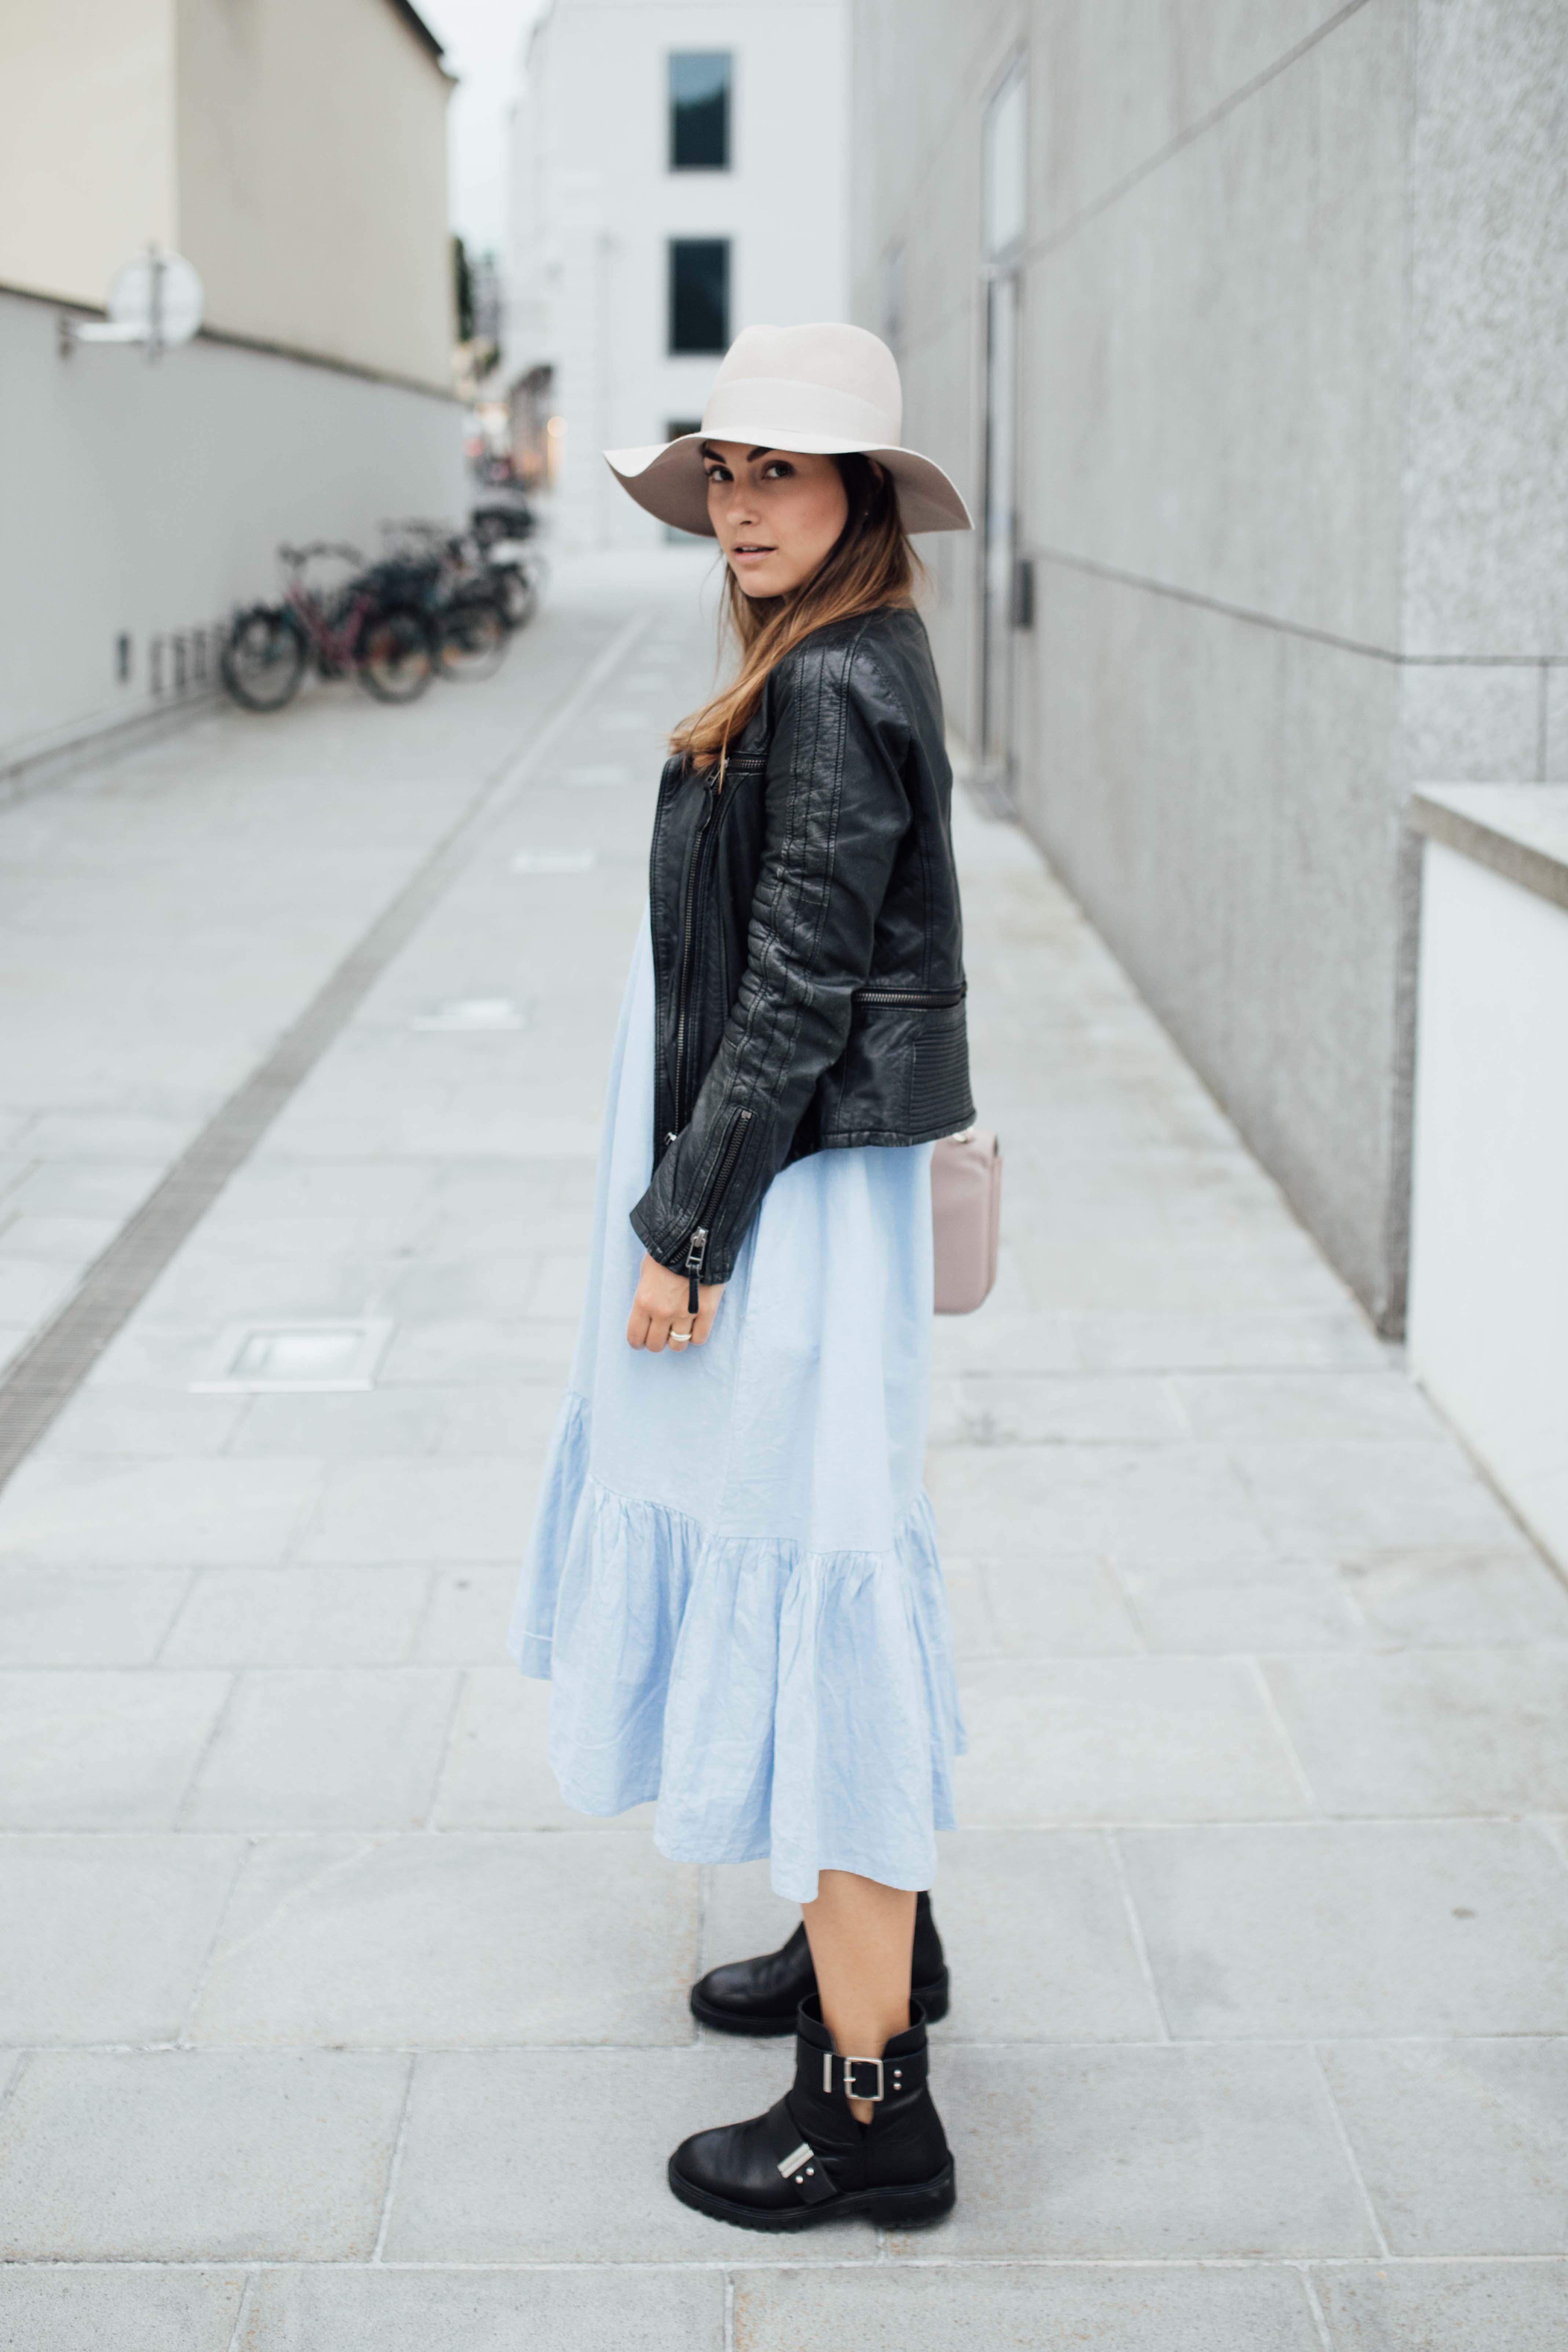 160919_yrml_blue_dress_web-13